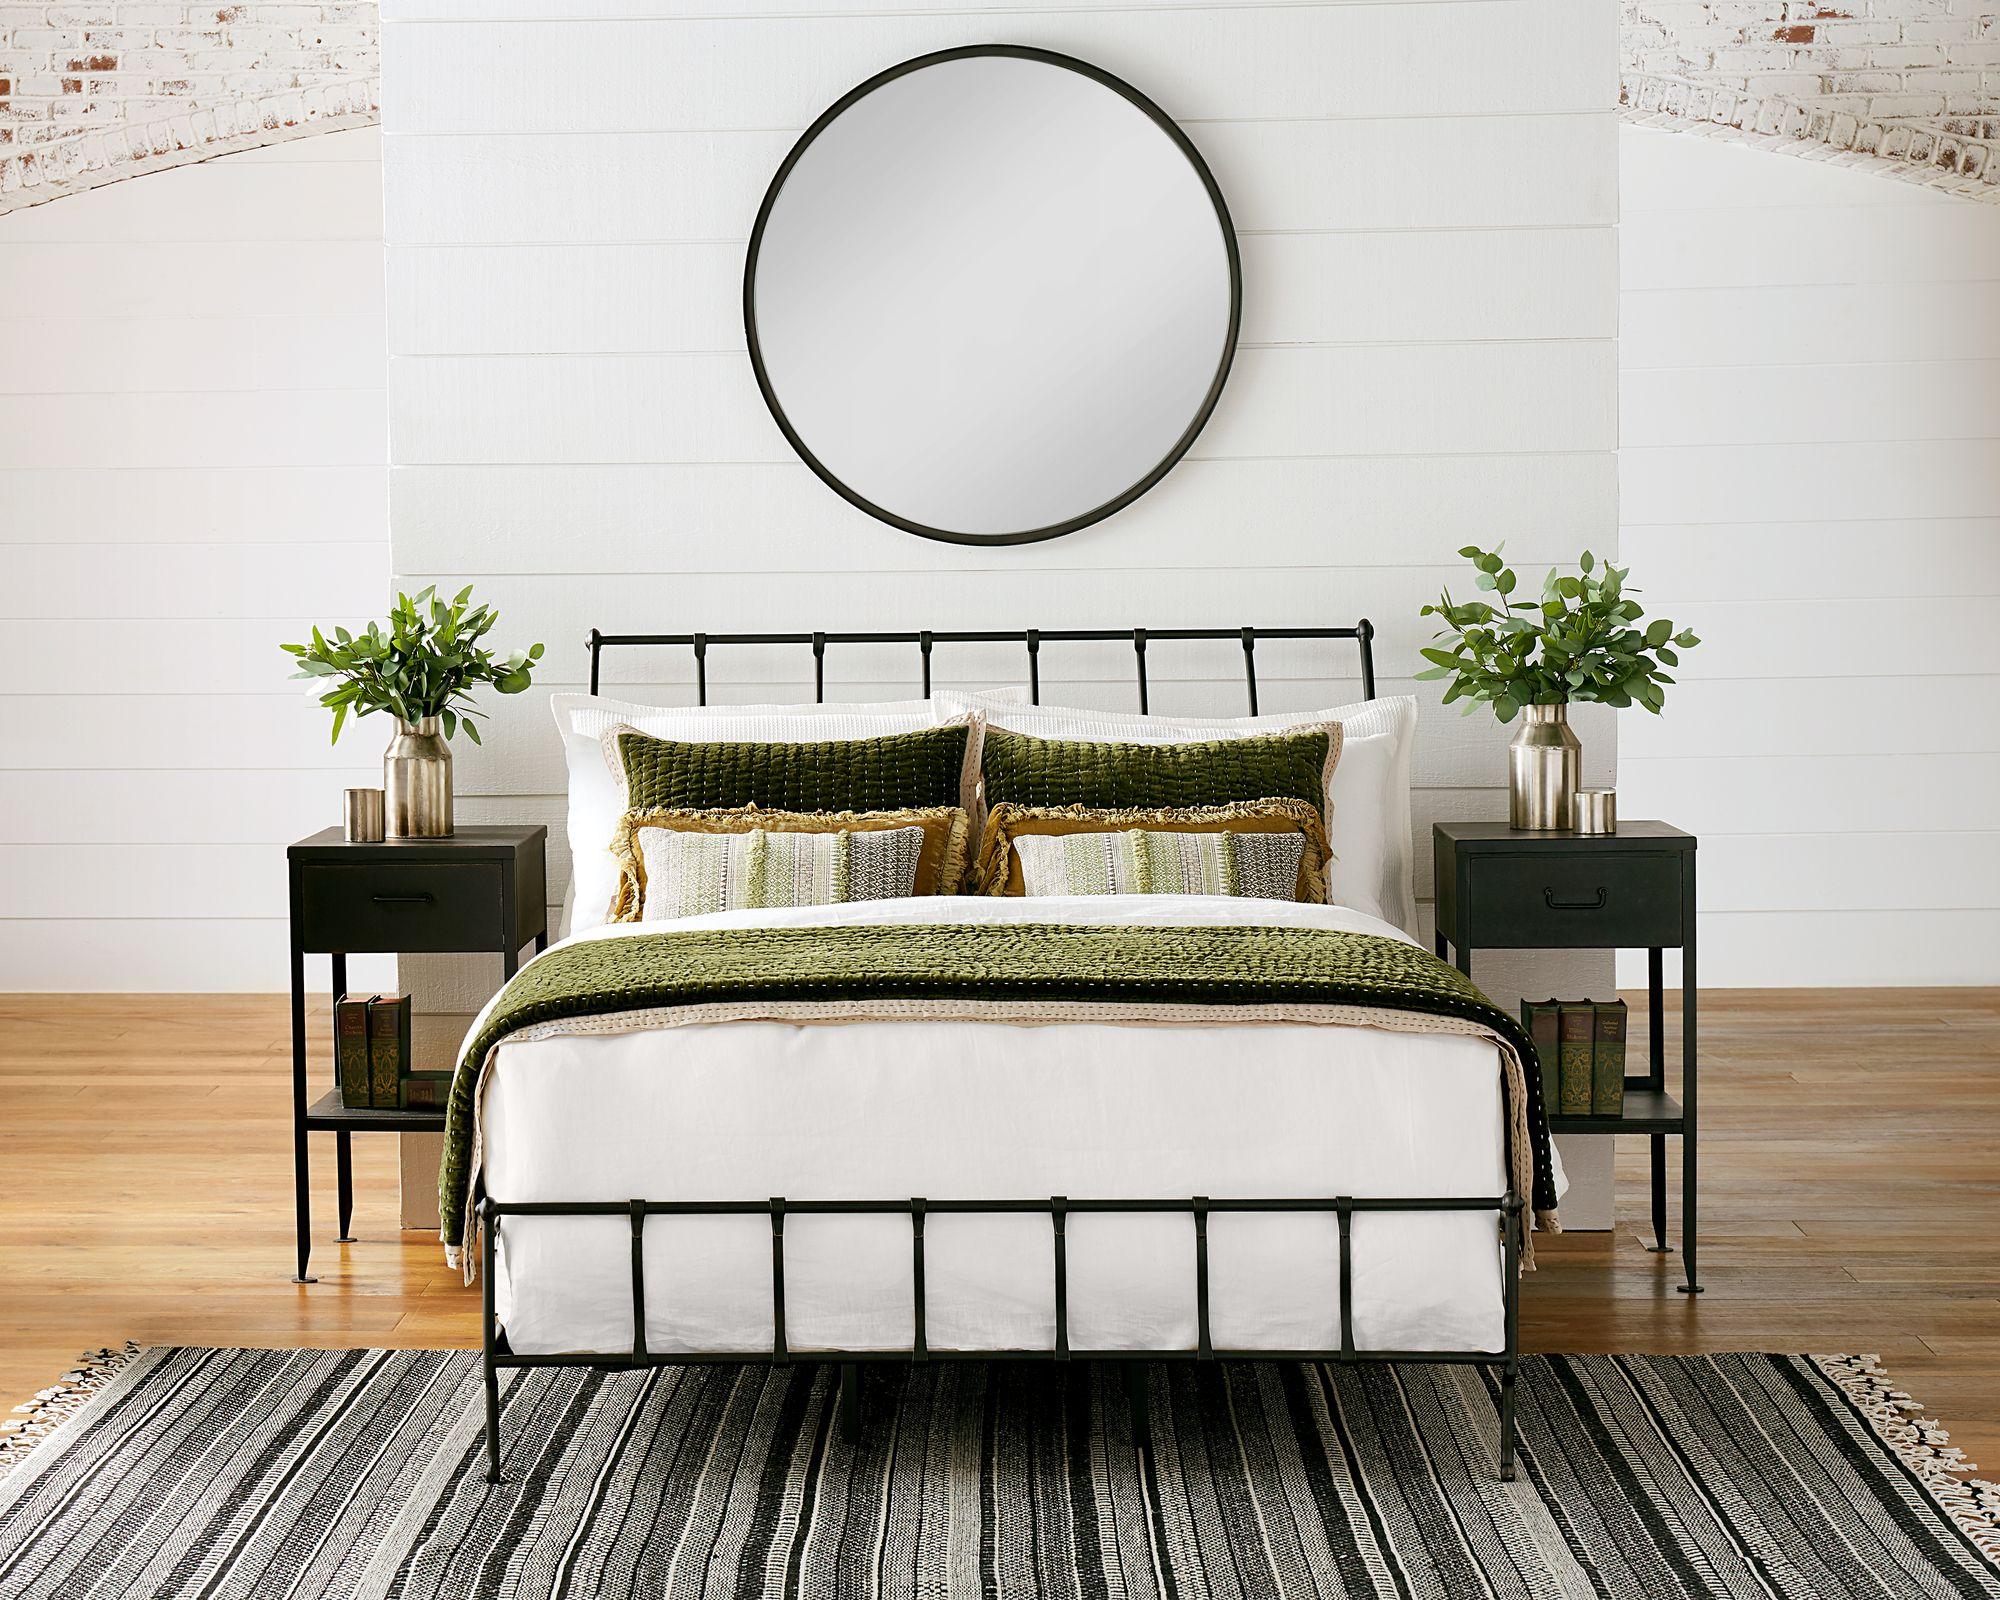 Rake Iron Bed With Metal Utility Table Magnolia Home